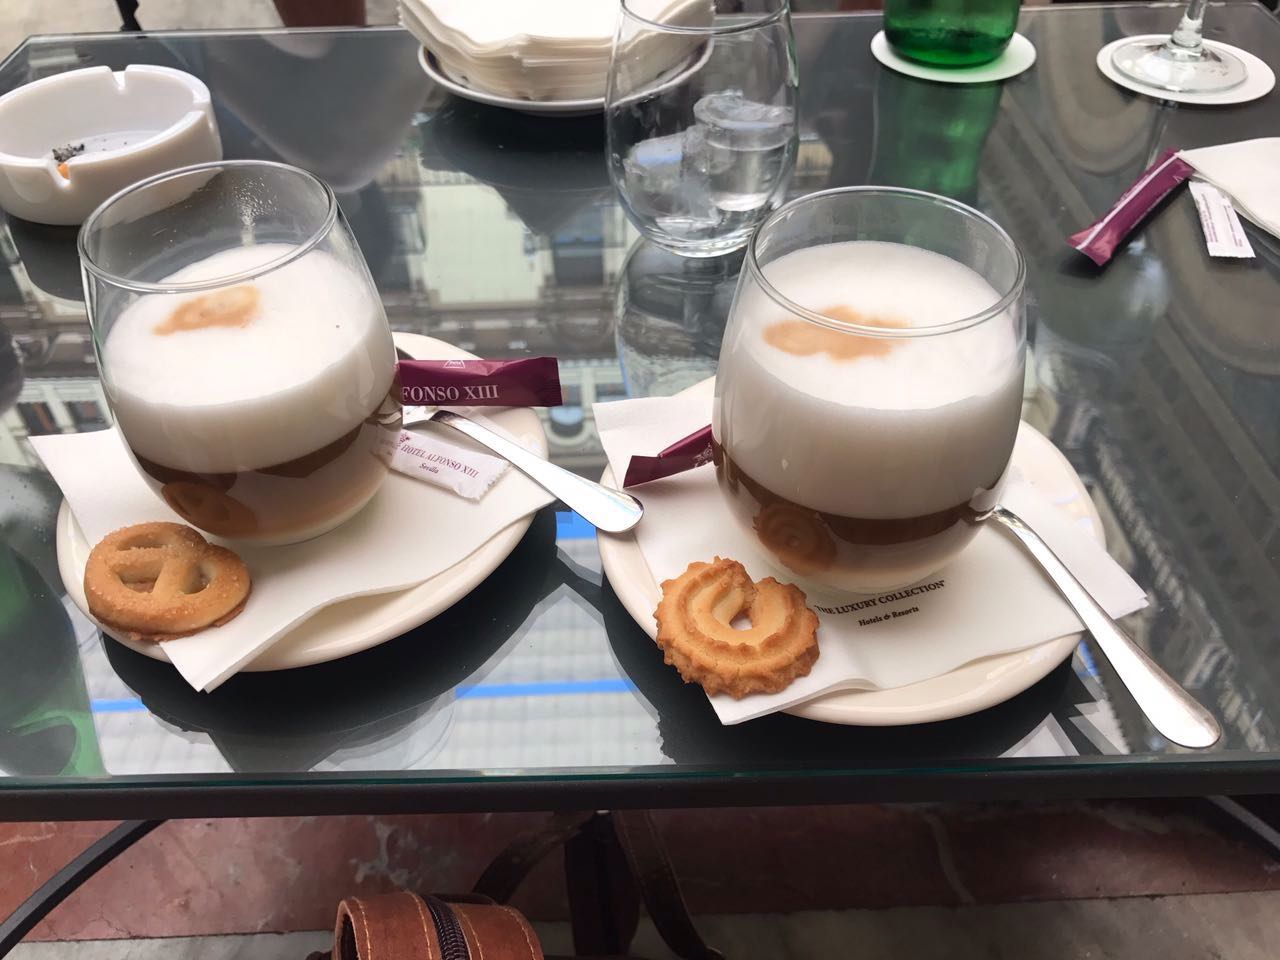 Tipps-Kurztrip-Sevilla-Handgepäck-Guide-Travel-Reiseblog-Reisen-hotel-alfonso-café-6